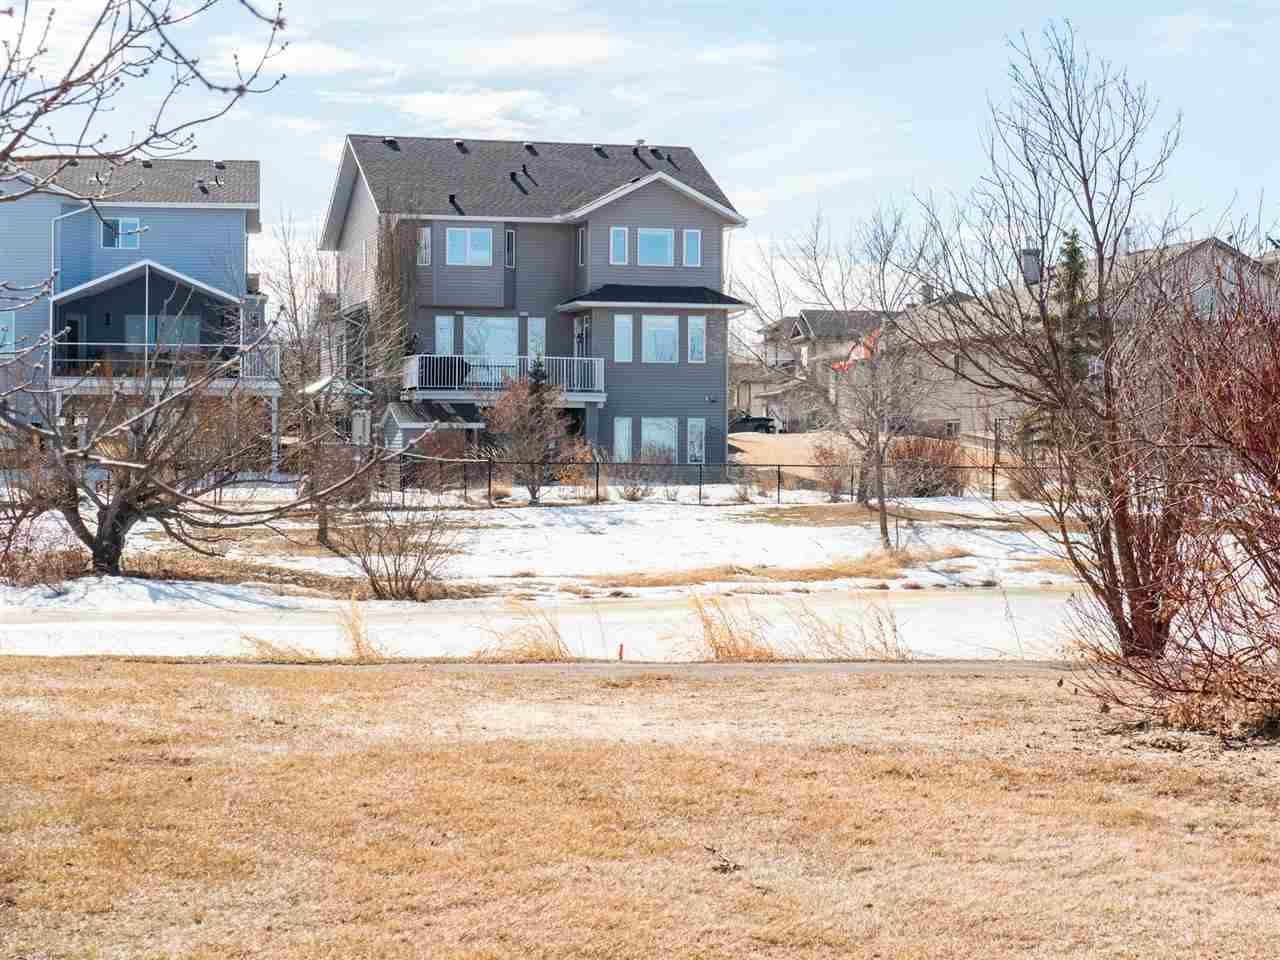 Main Photo: 130 REICHERT Drive: Beaumont House for sale : MLS®# E4233184